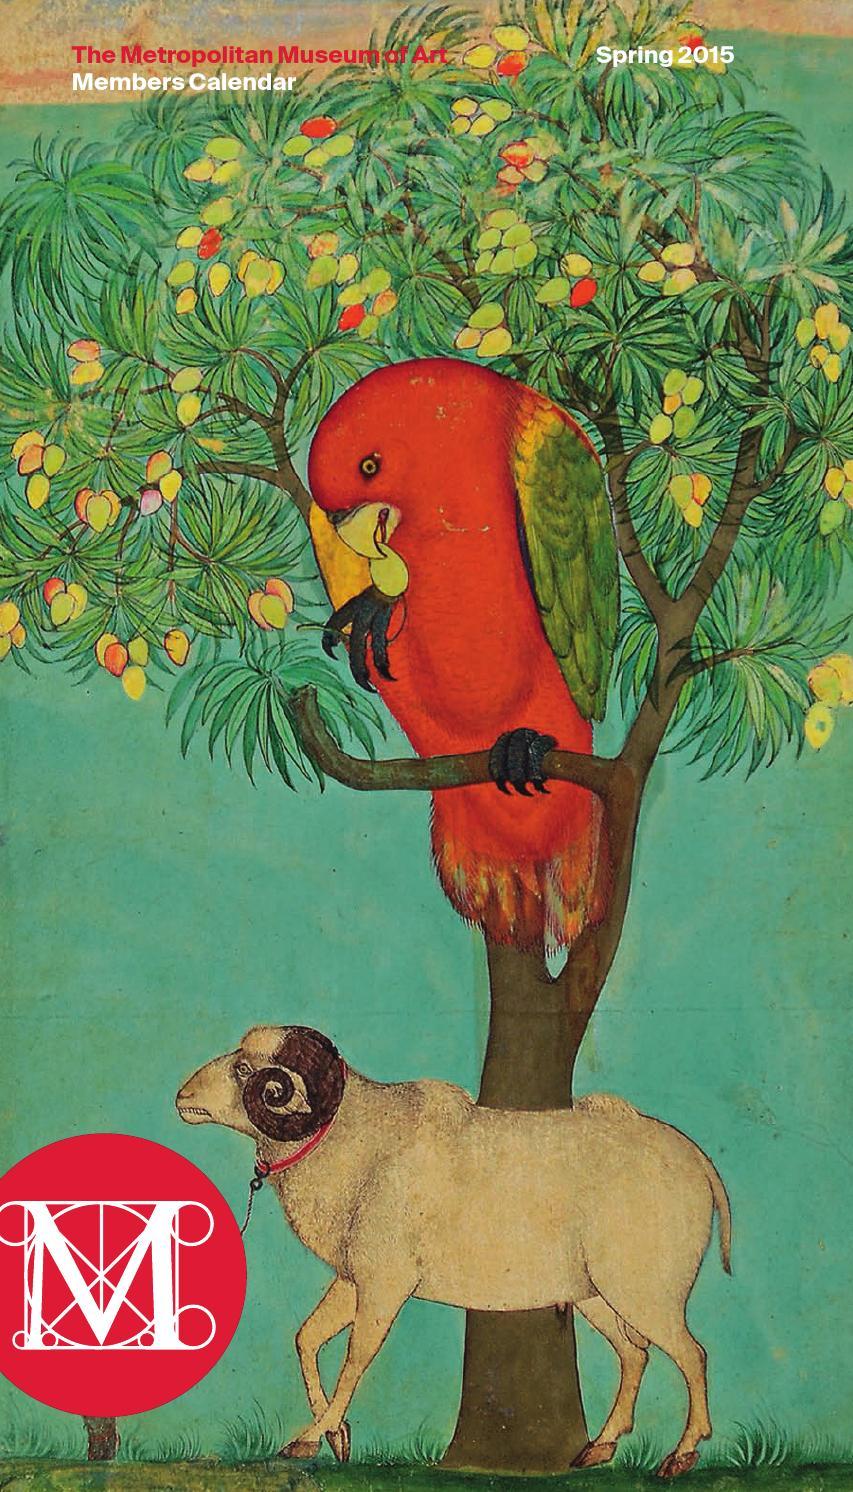 Met Art Calendar : Members calendar spring by the metropolitan museum